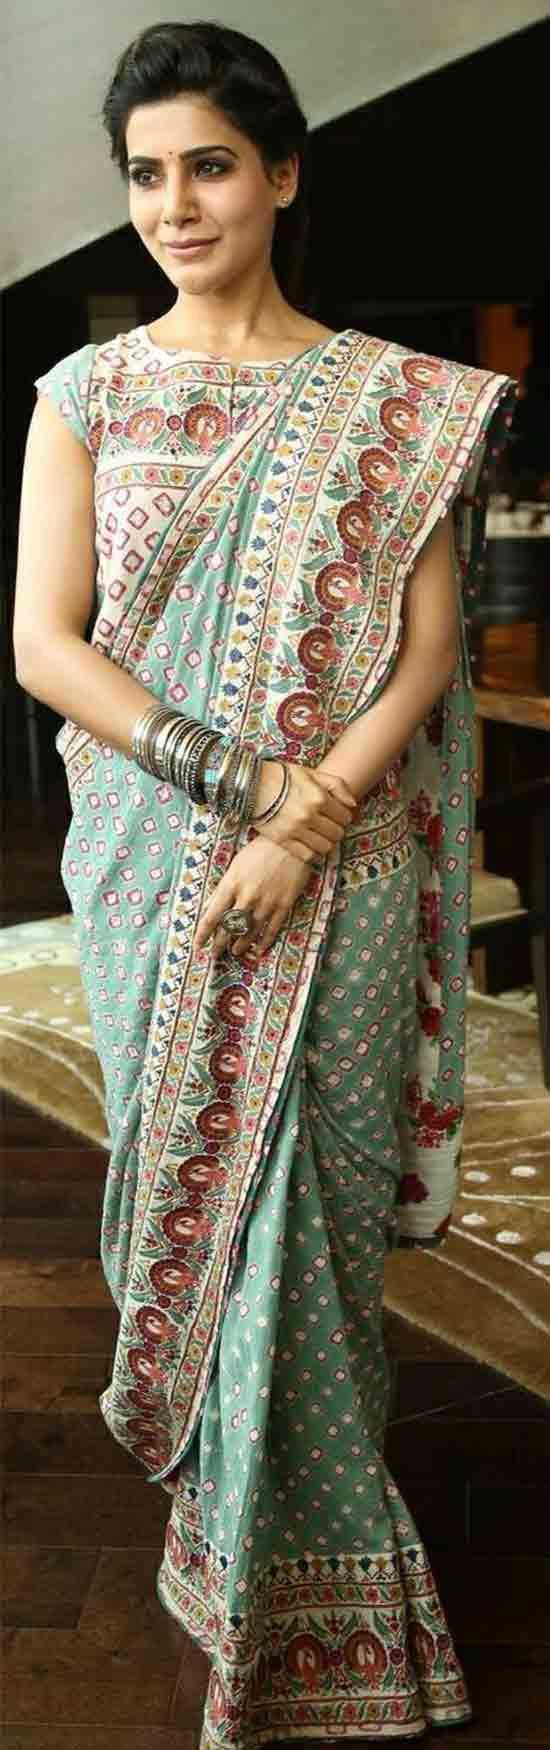 Samantha-Ruth-Prabhu-In-Designer-Saree